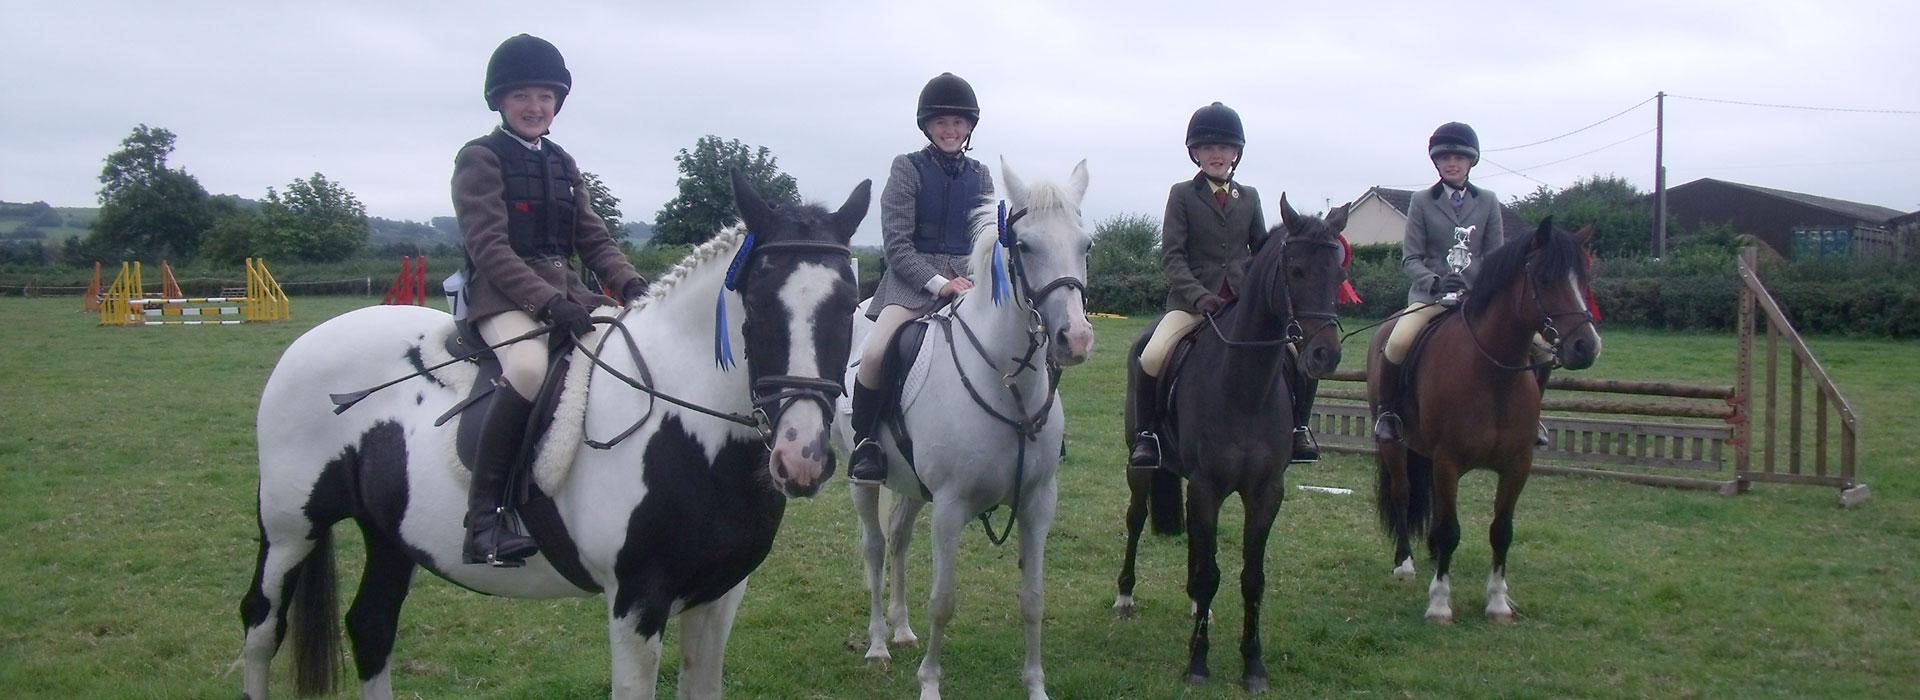 Foxham Horse Show